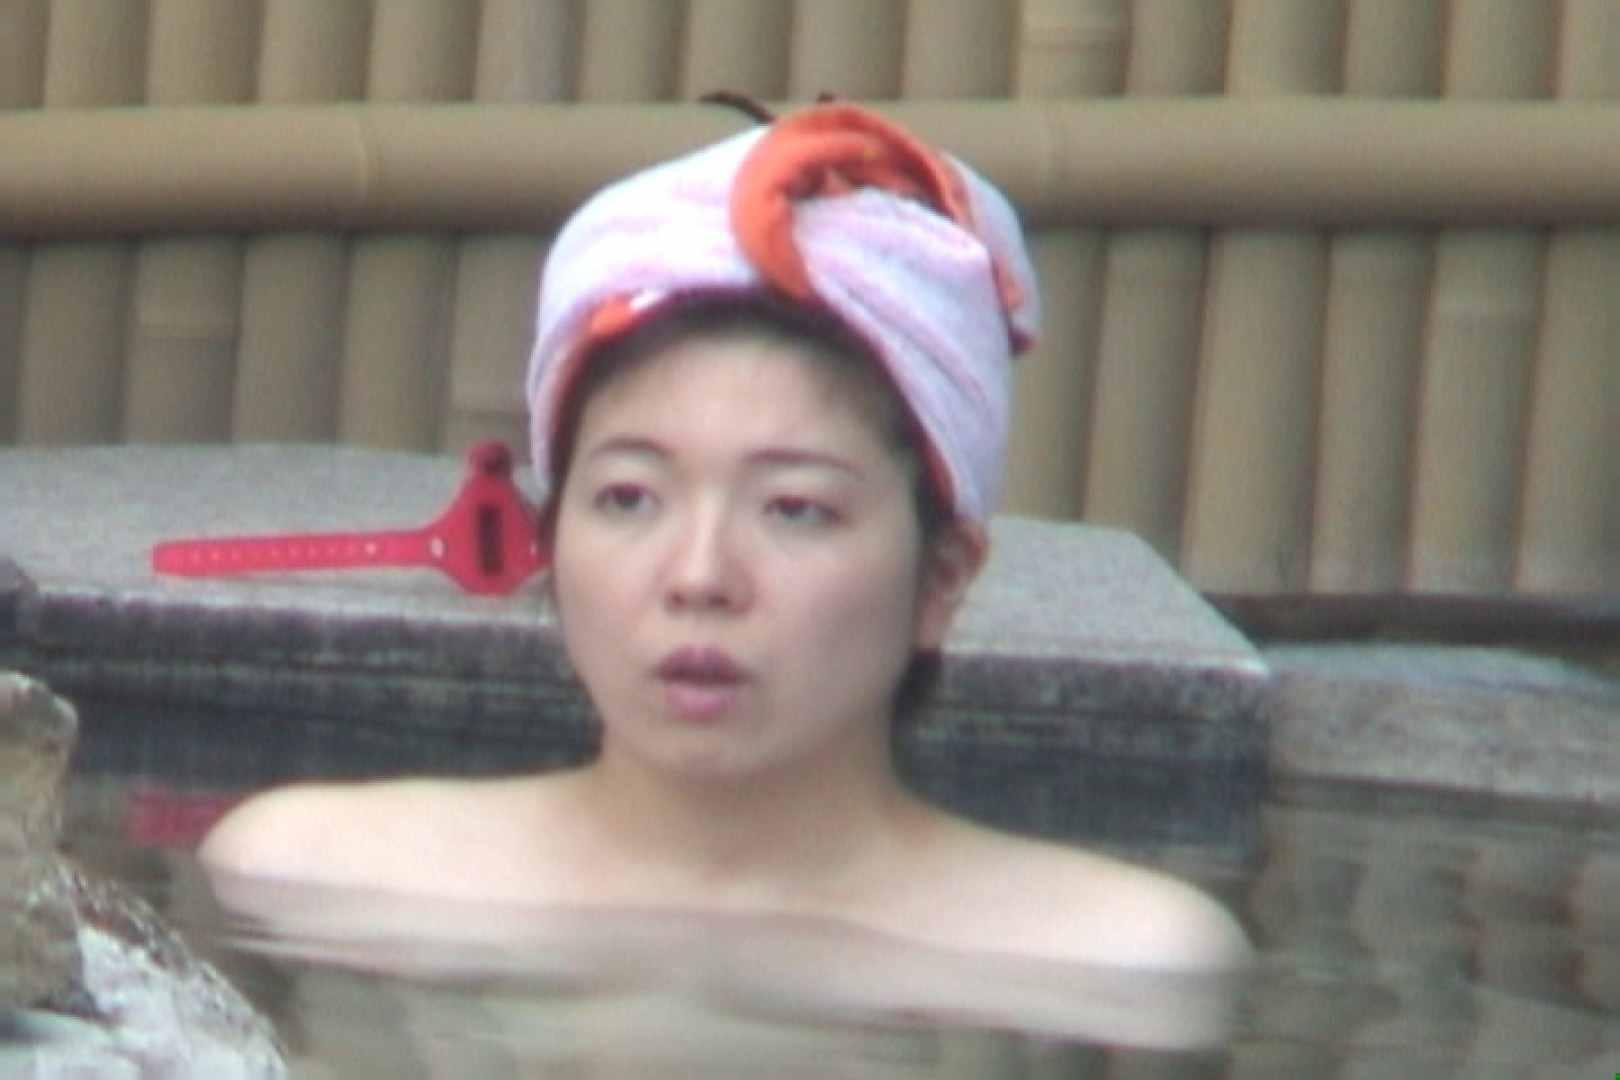 Aquaな露天風呂Vol.573 盗撮シリーズ | 露天風呂編  78PIX 71